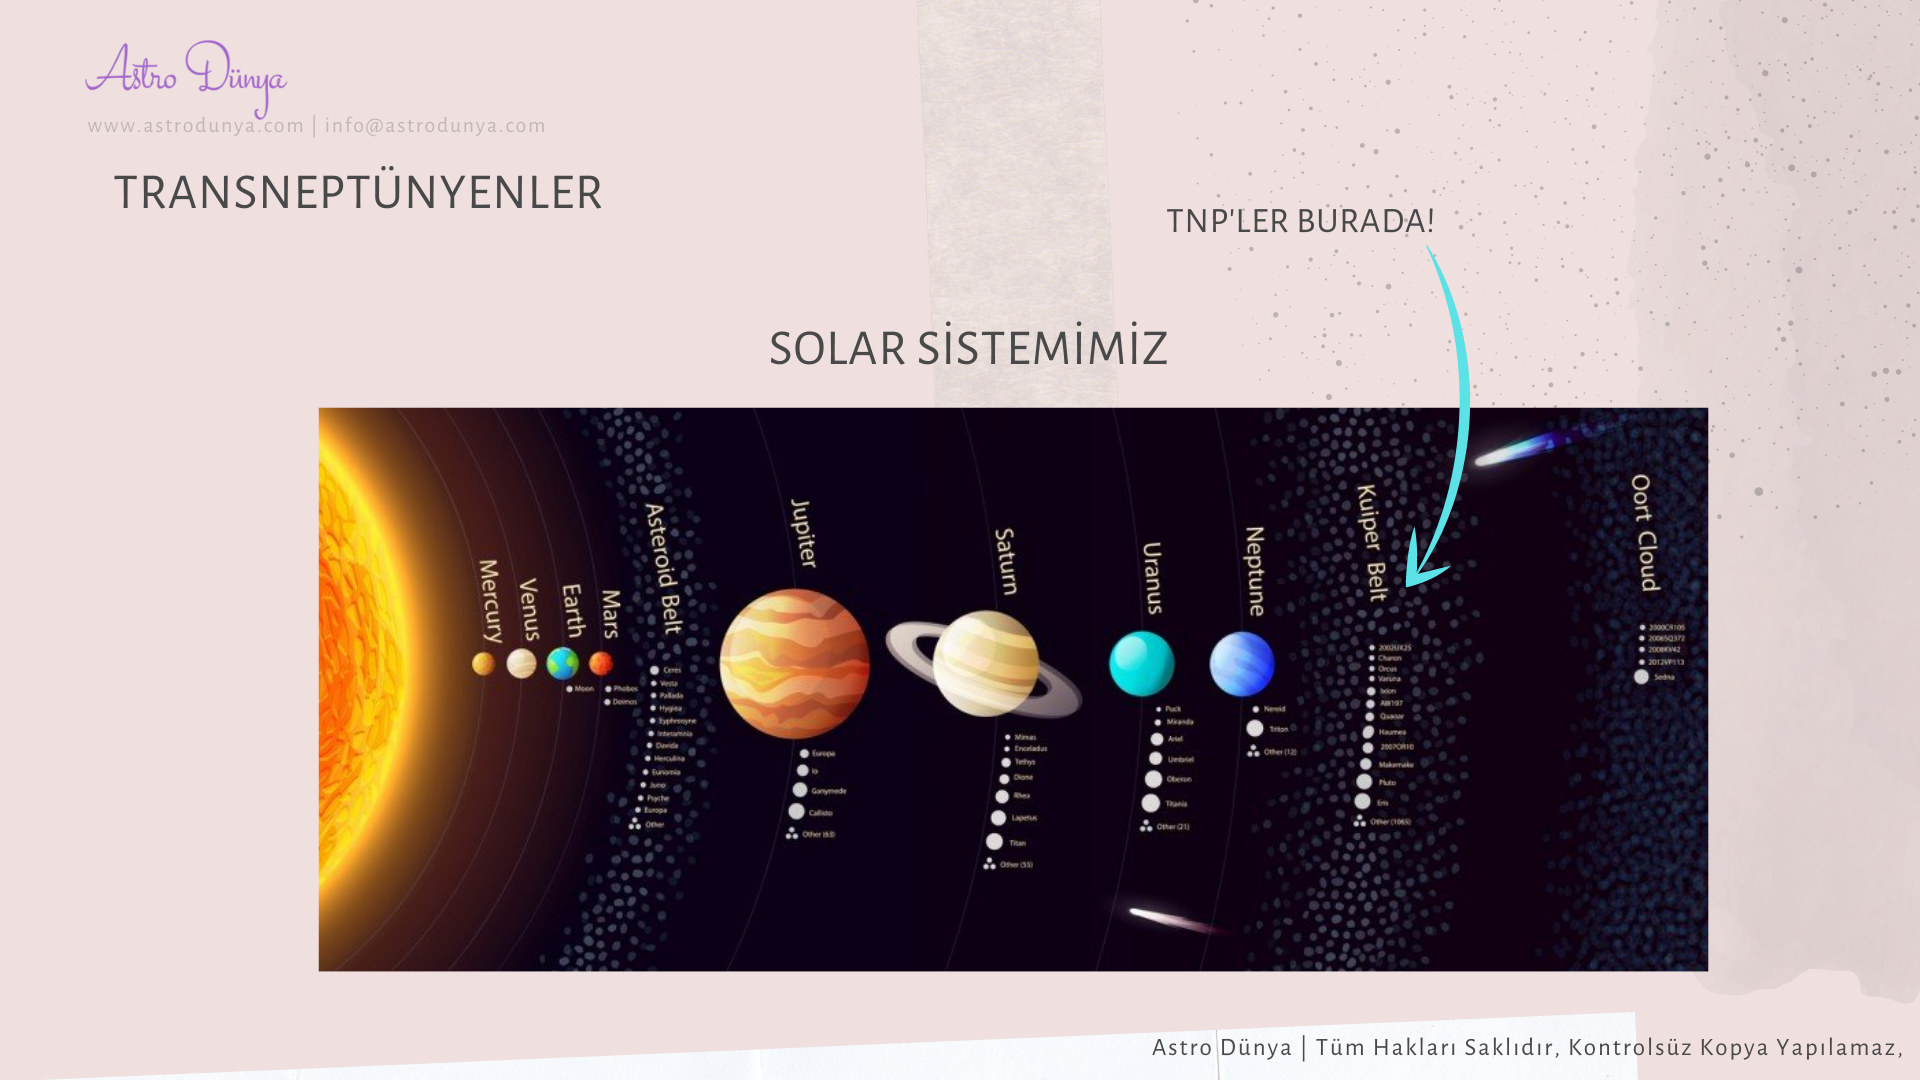 Uranyen Astroloji Transneptünyenler Hipotetik Noktalar